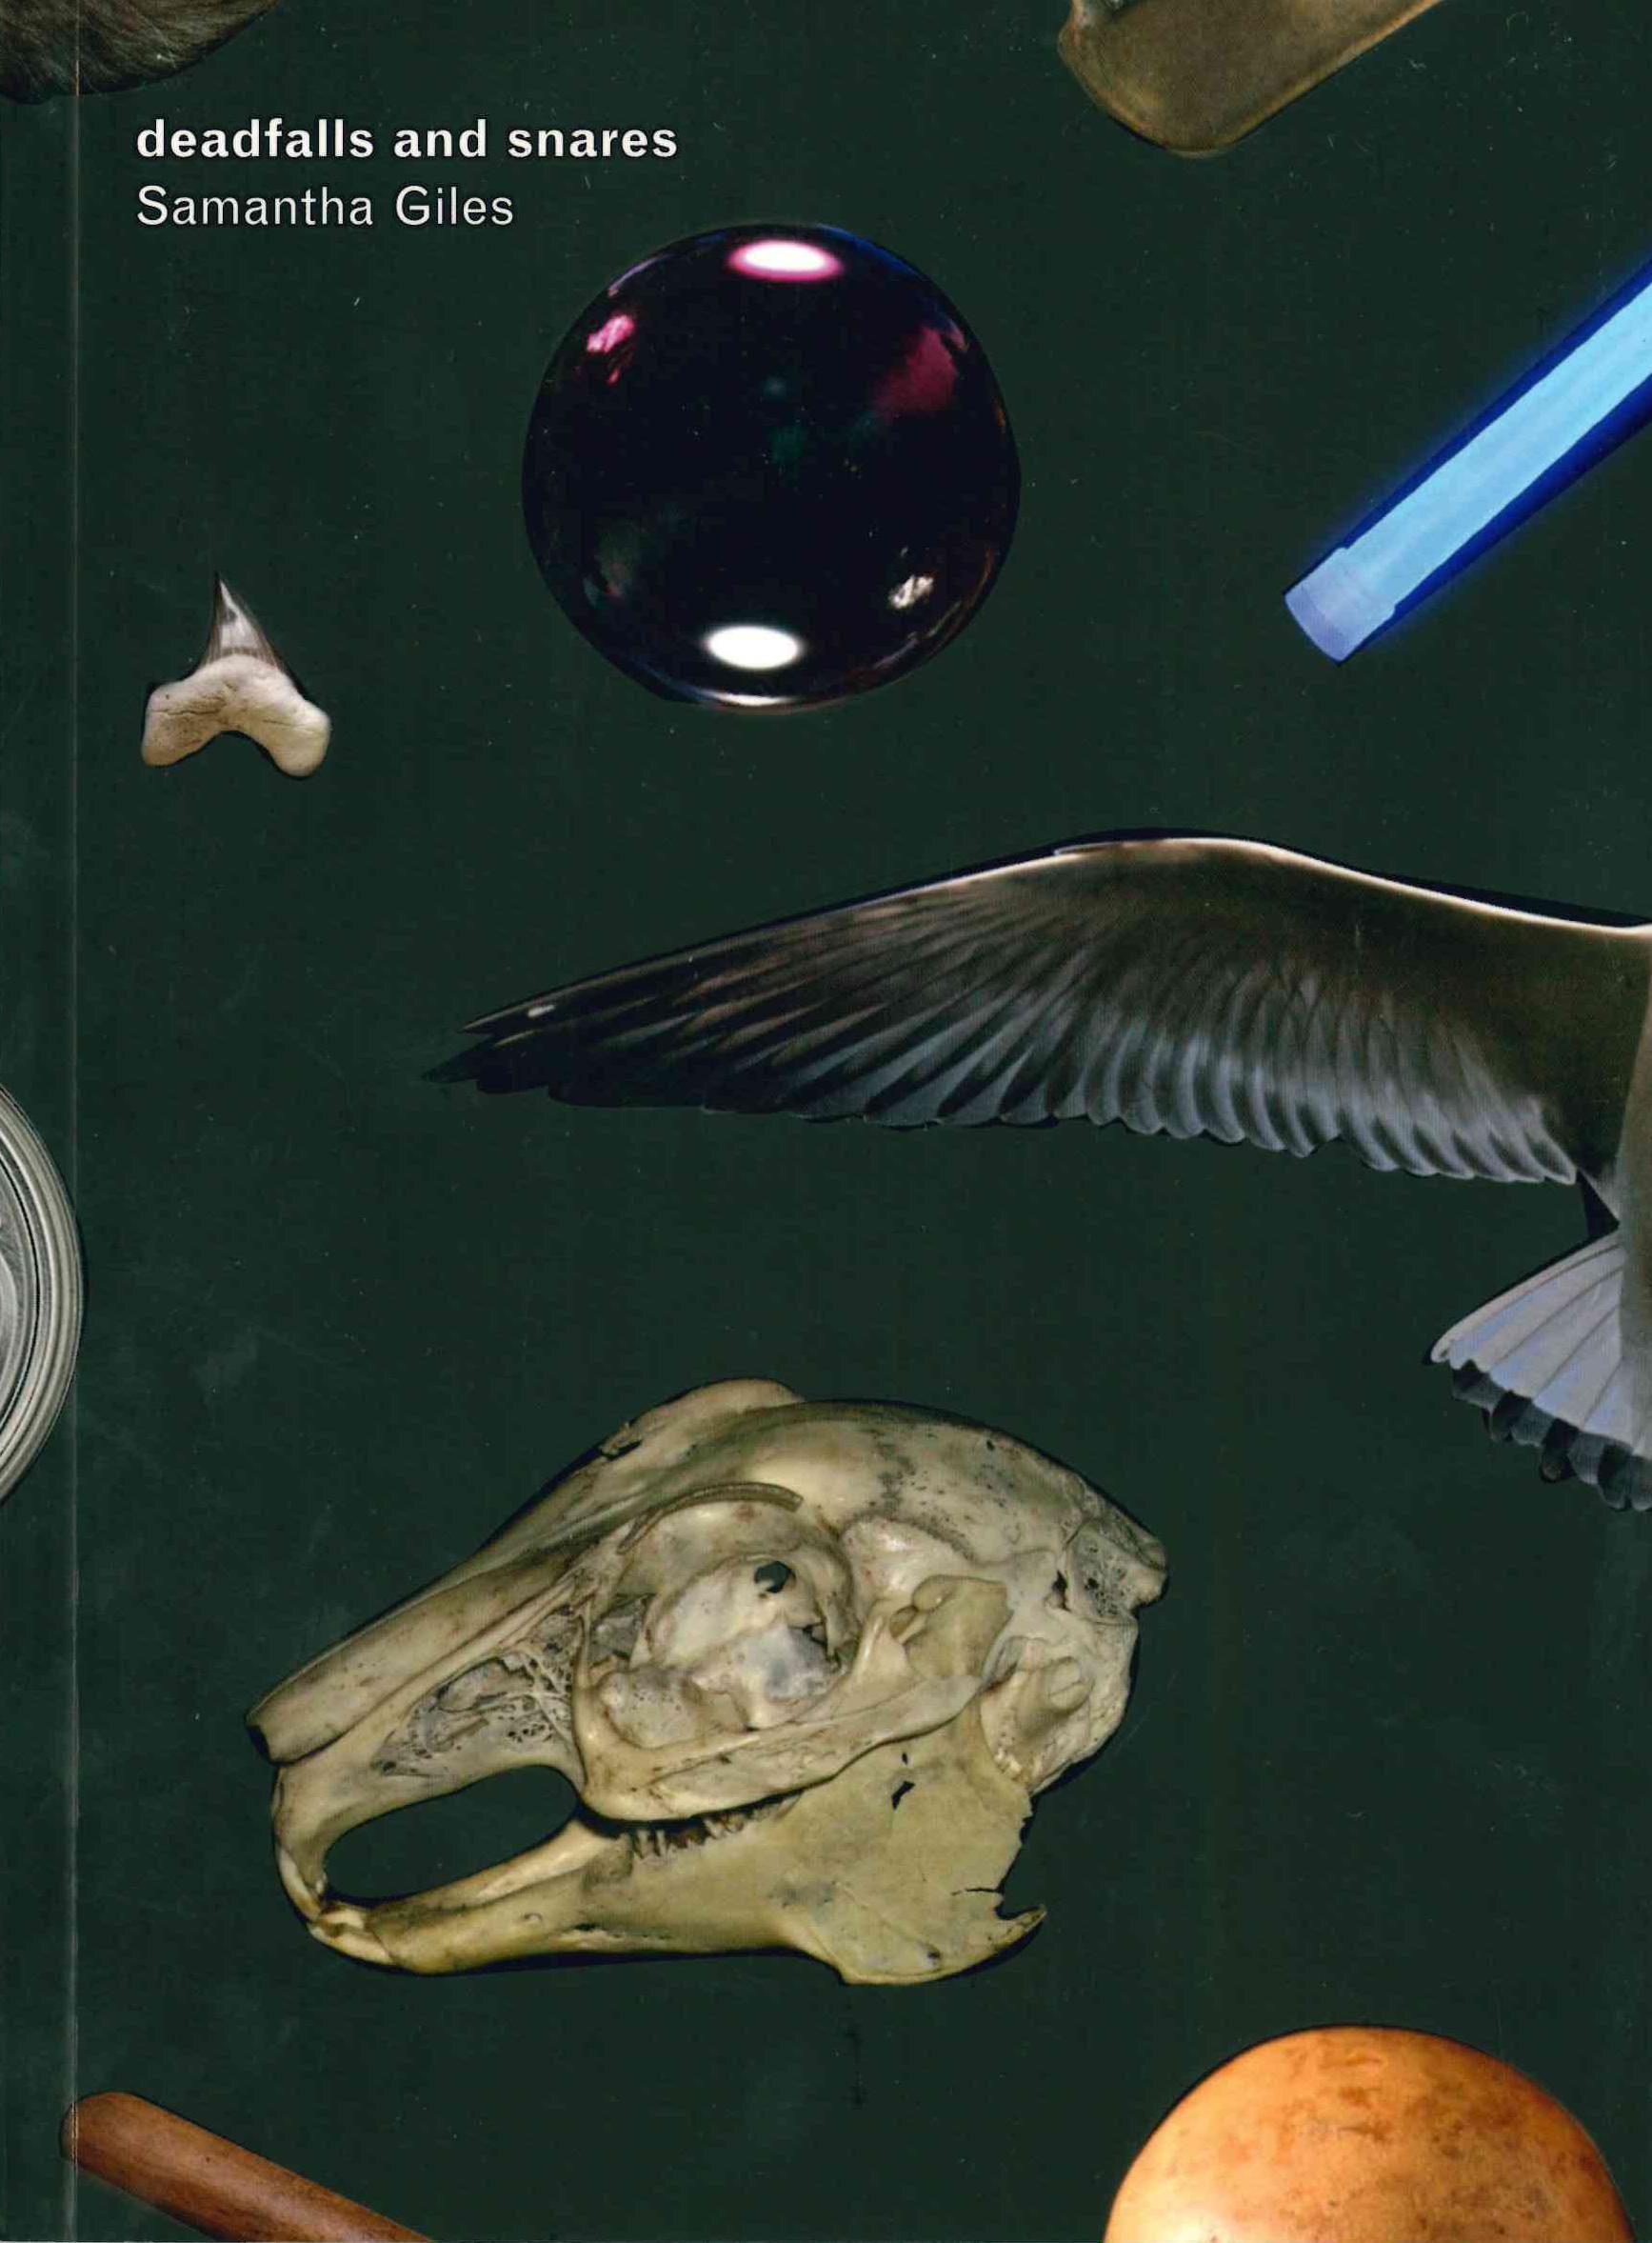 deadfalls & snares | samantha giles | futurepoem books